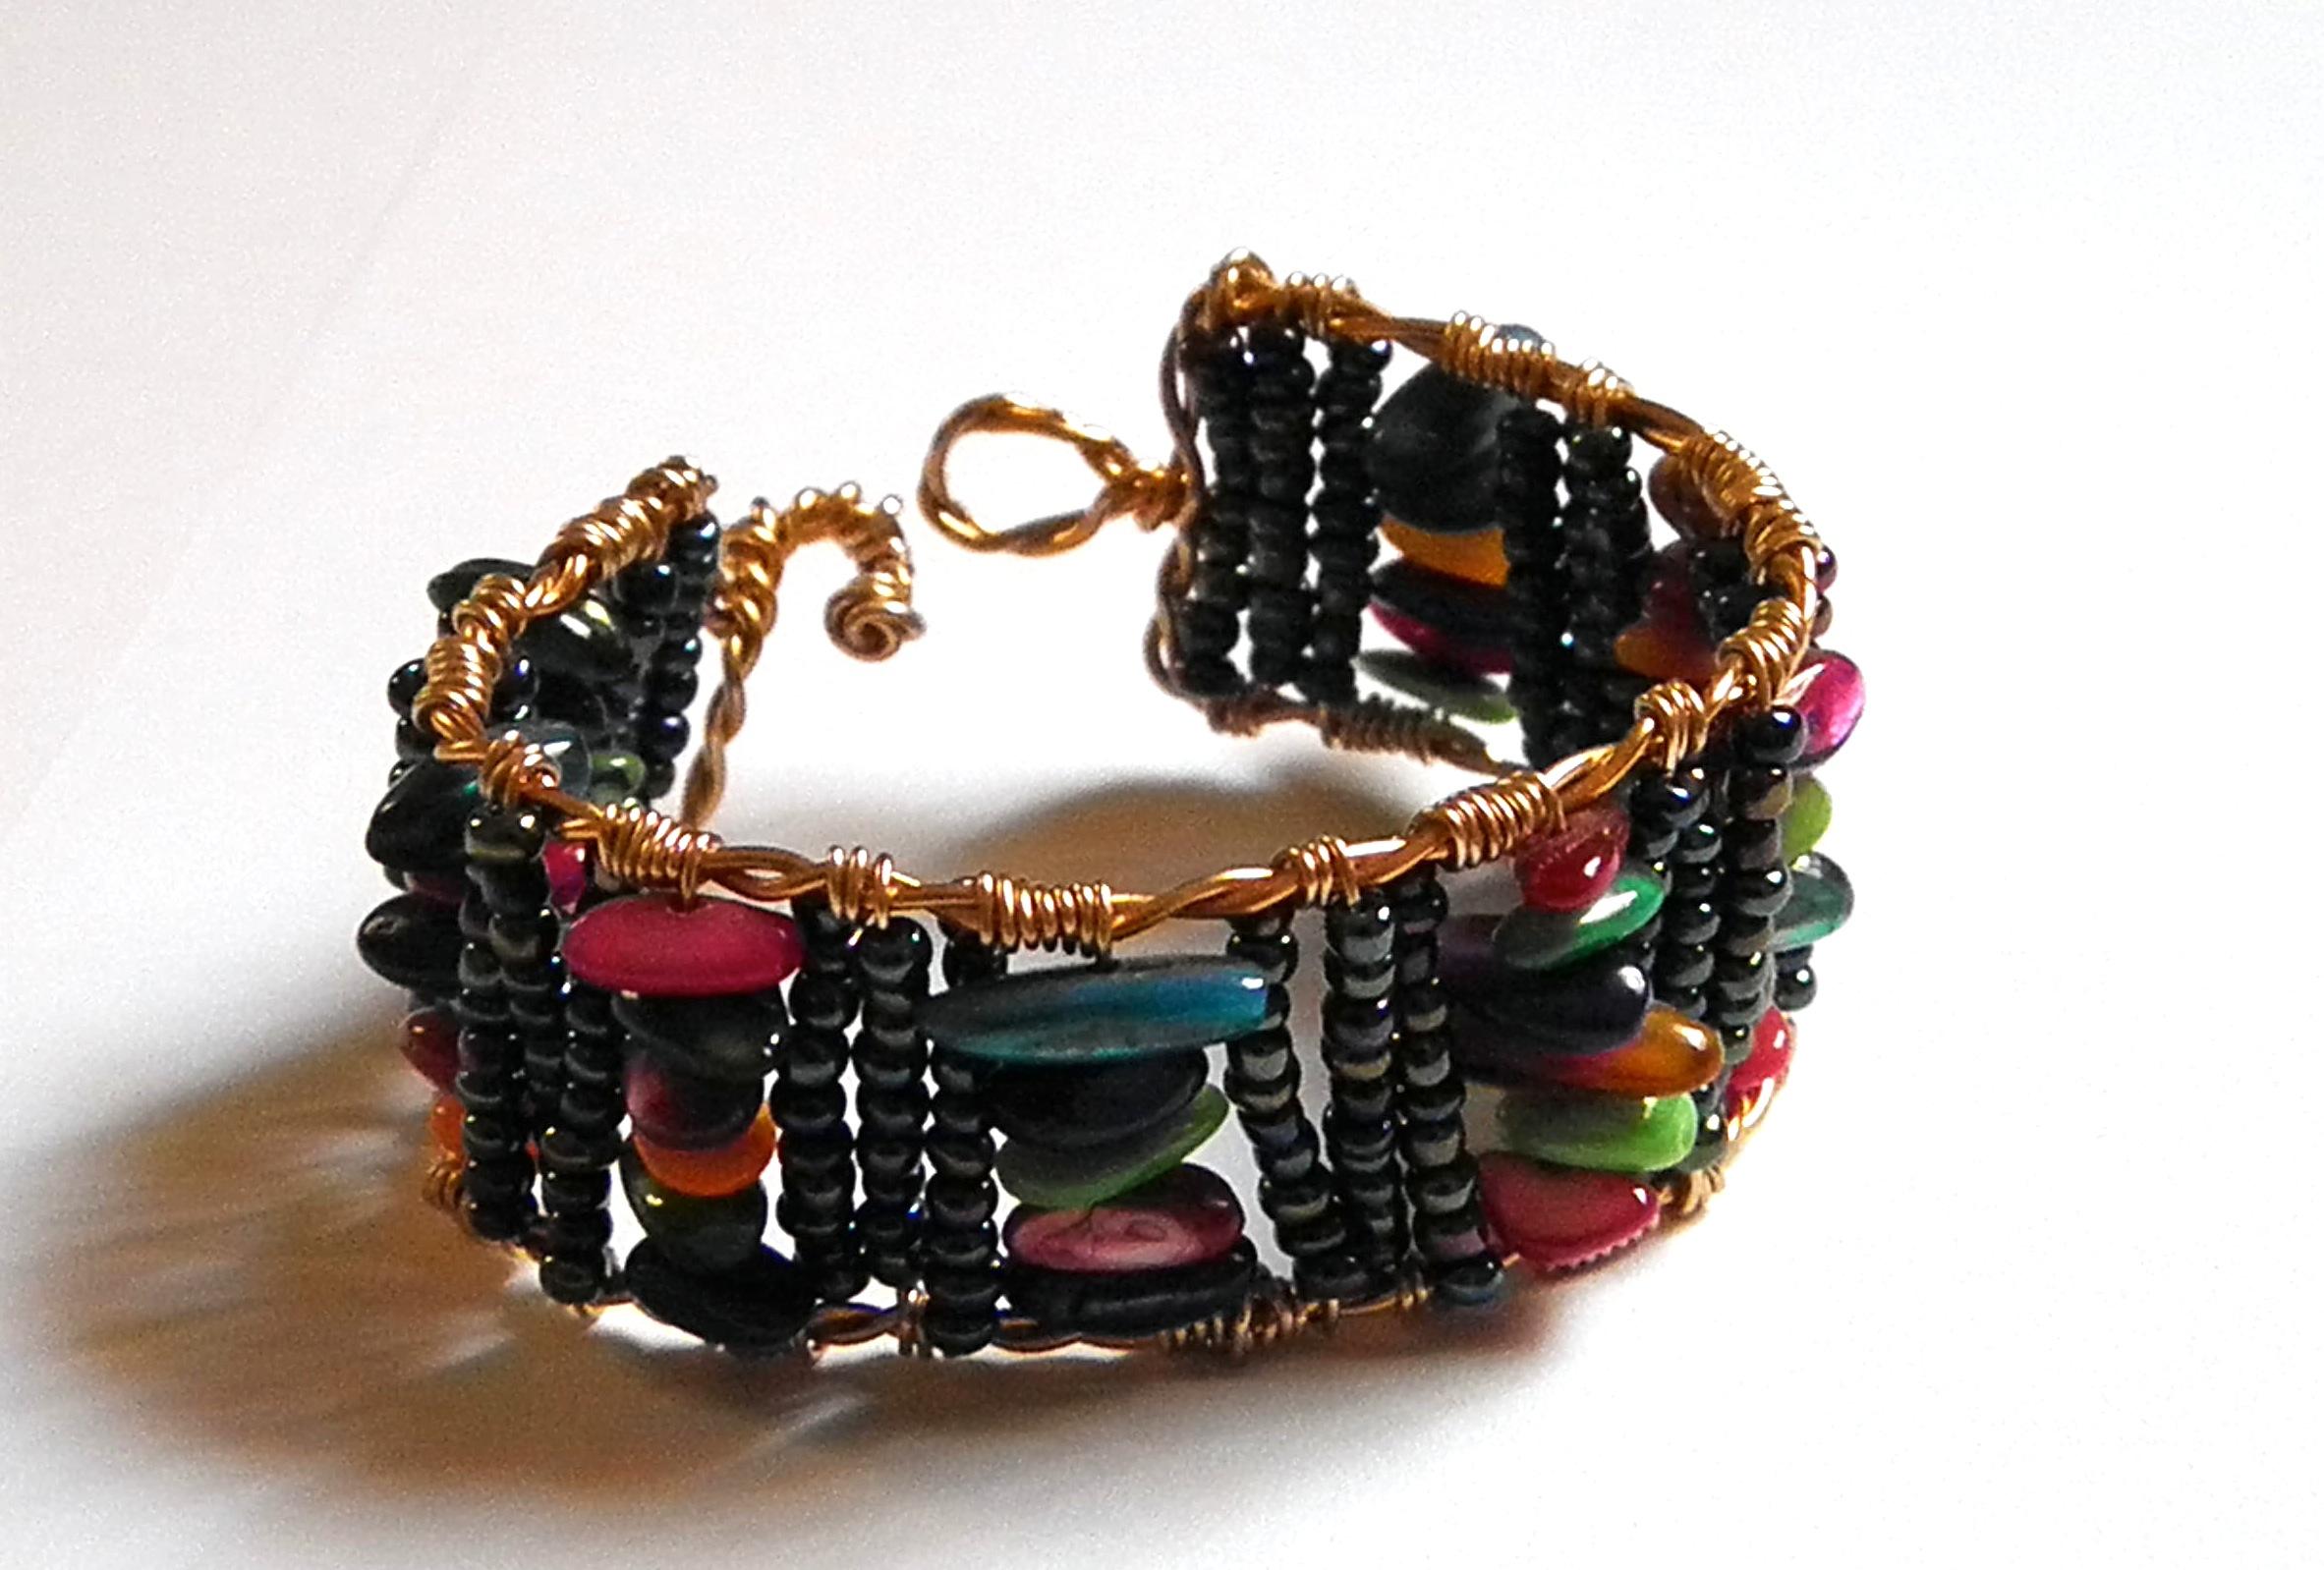 Skittle Rainbow Bracelet